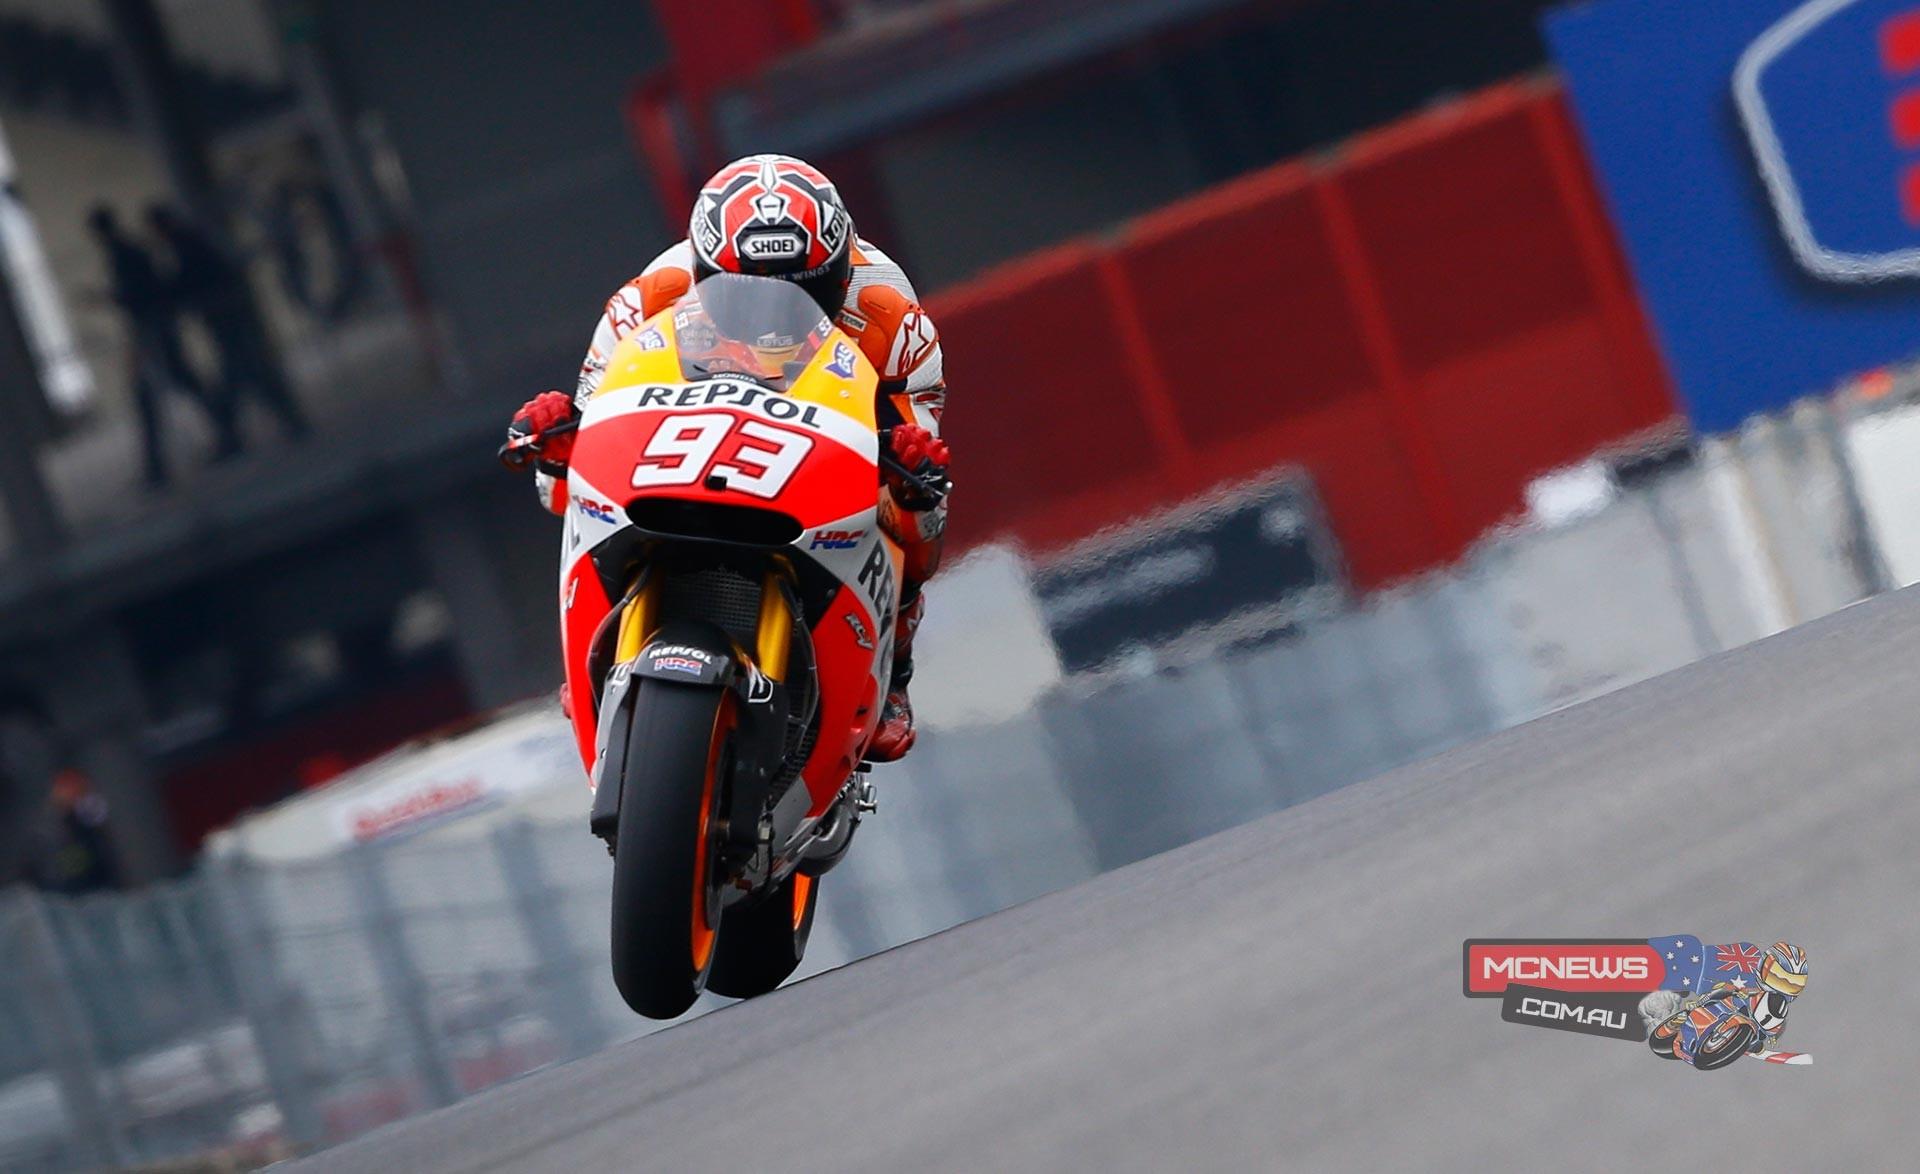 Marc Marquez 93 Motogp Image Wallpaper ...